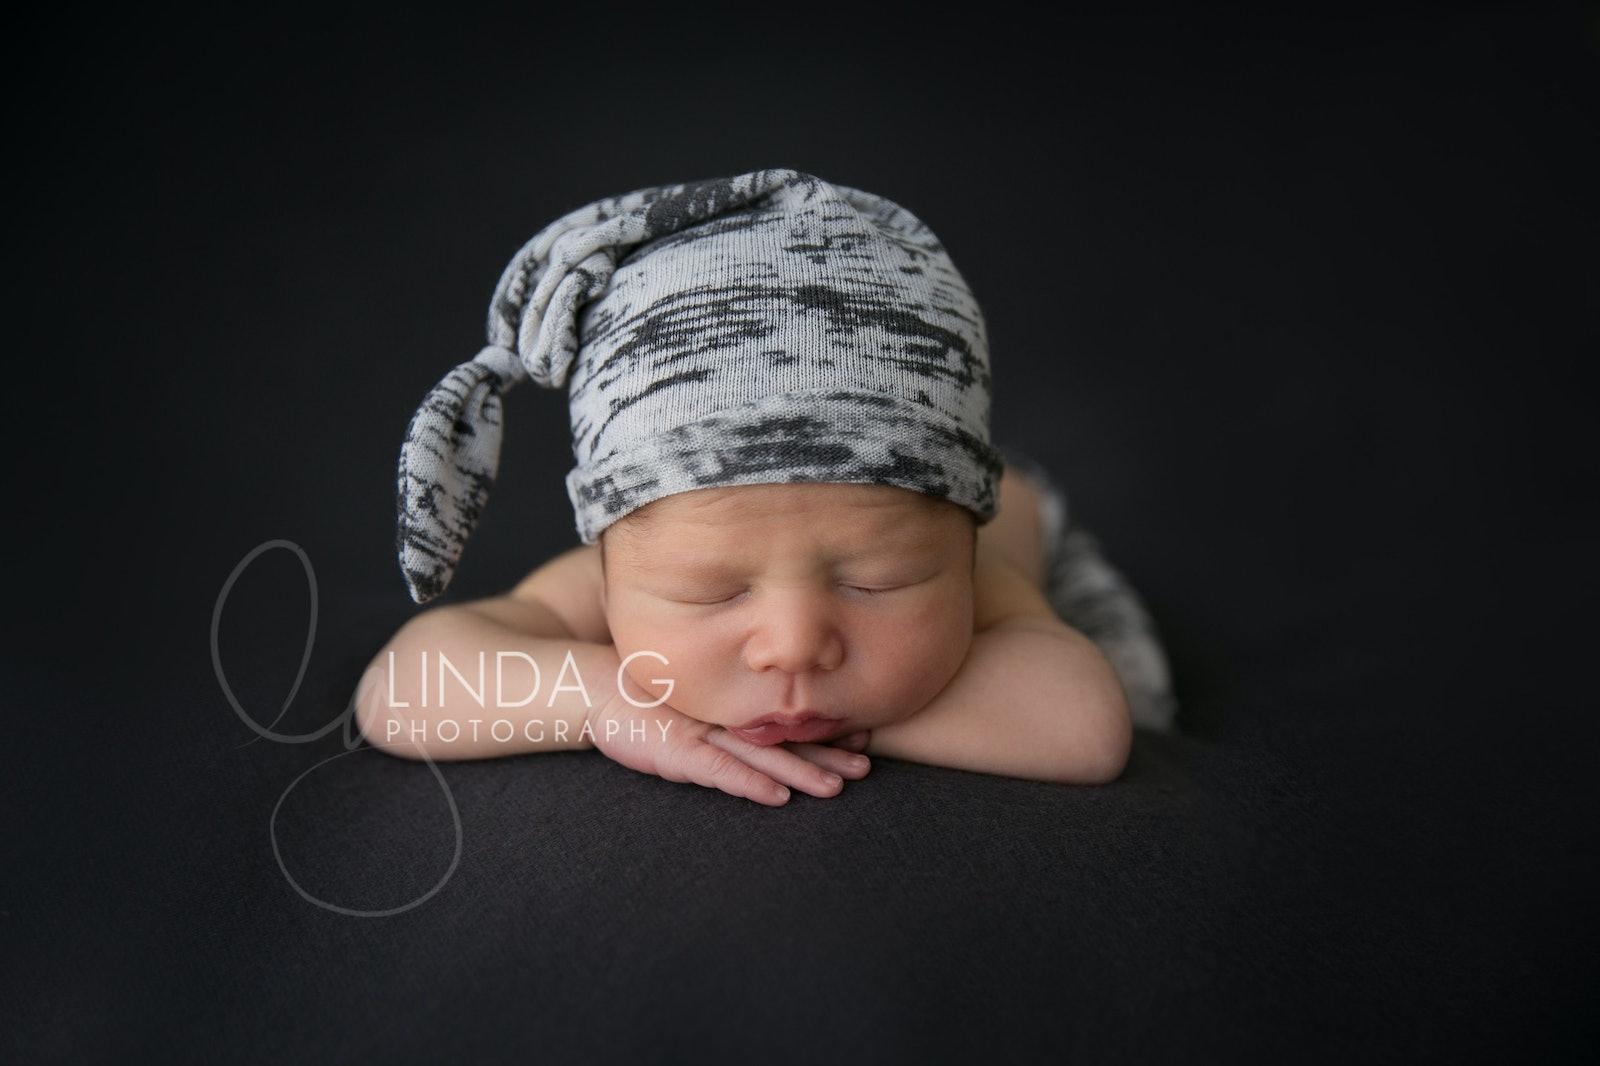 award winning sydney inner west newborn photographer 3